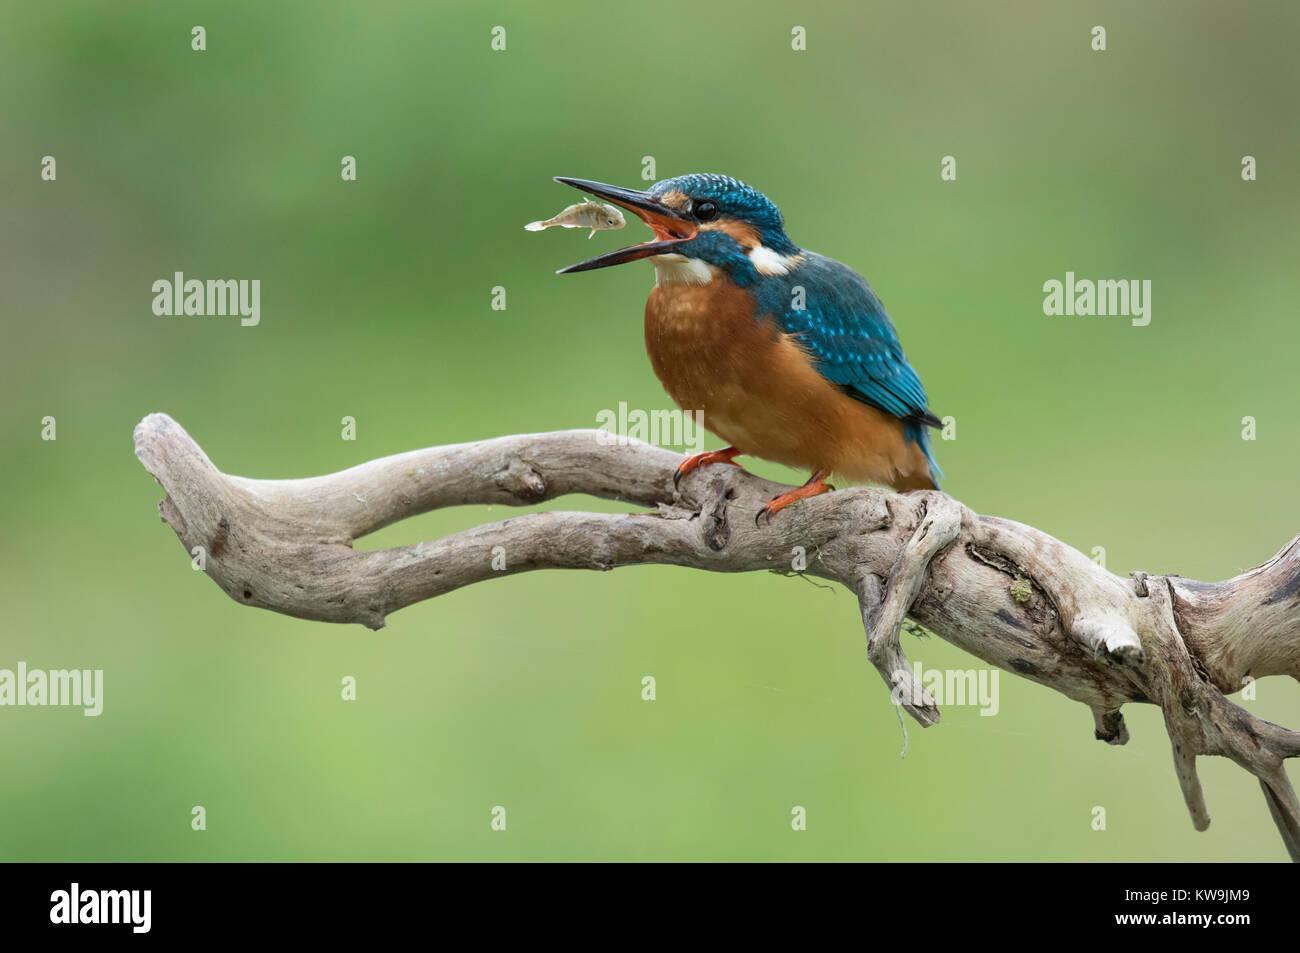 Common Kingfisher - Stock Image